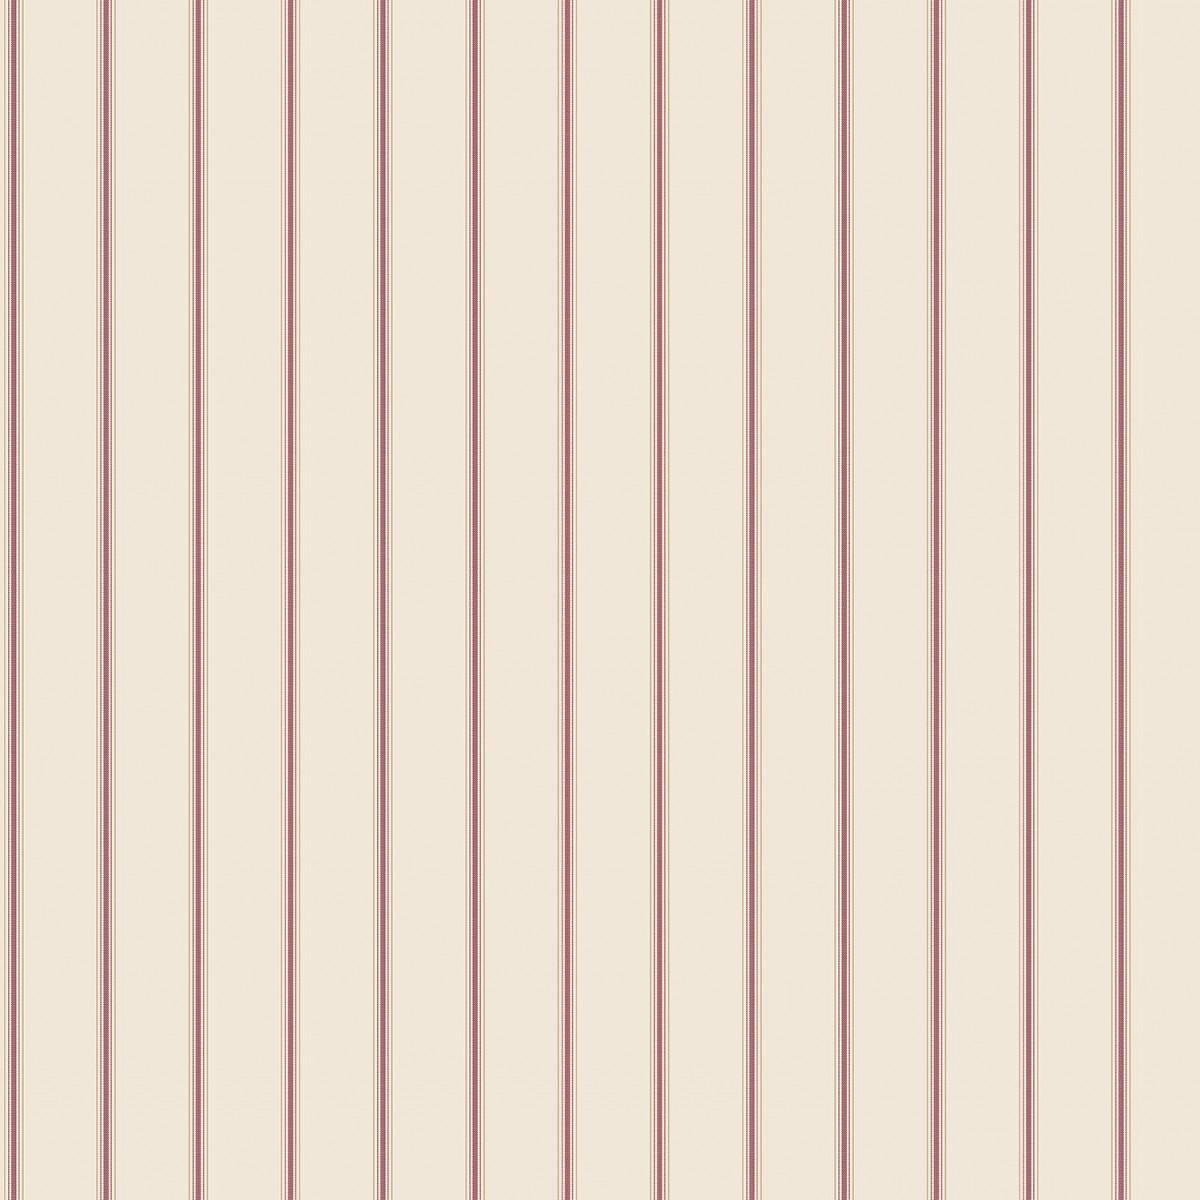 Tapet - Små romantiske striber i bordeaux rød med creme bund